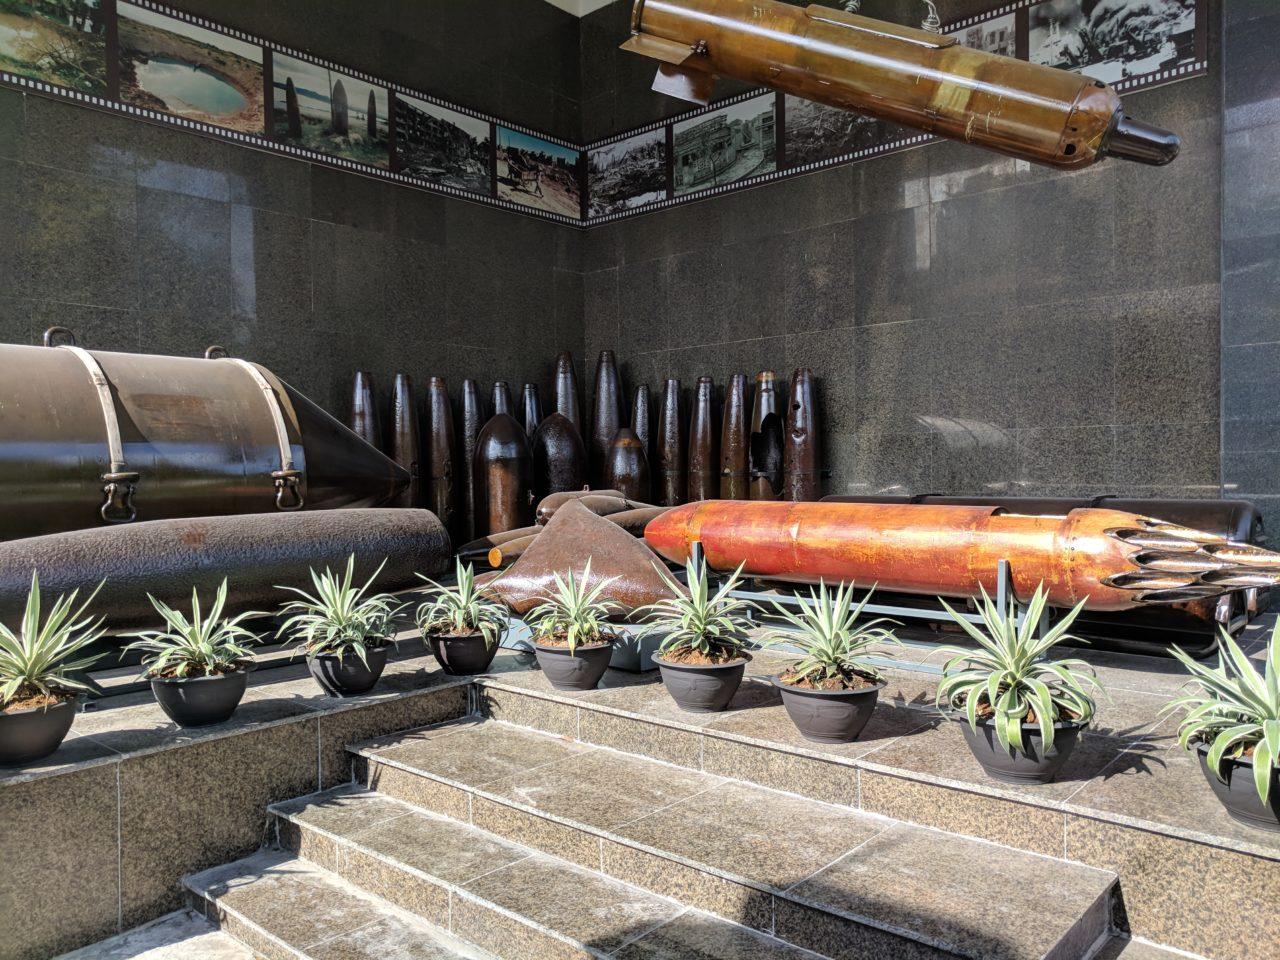 Unexploded ammunition